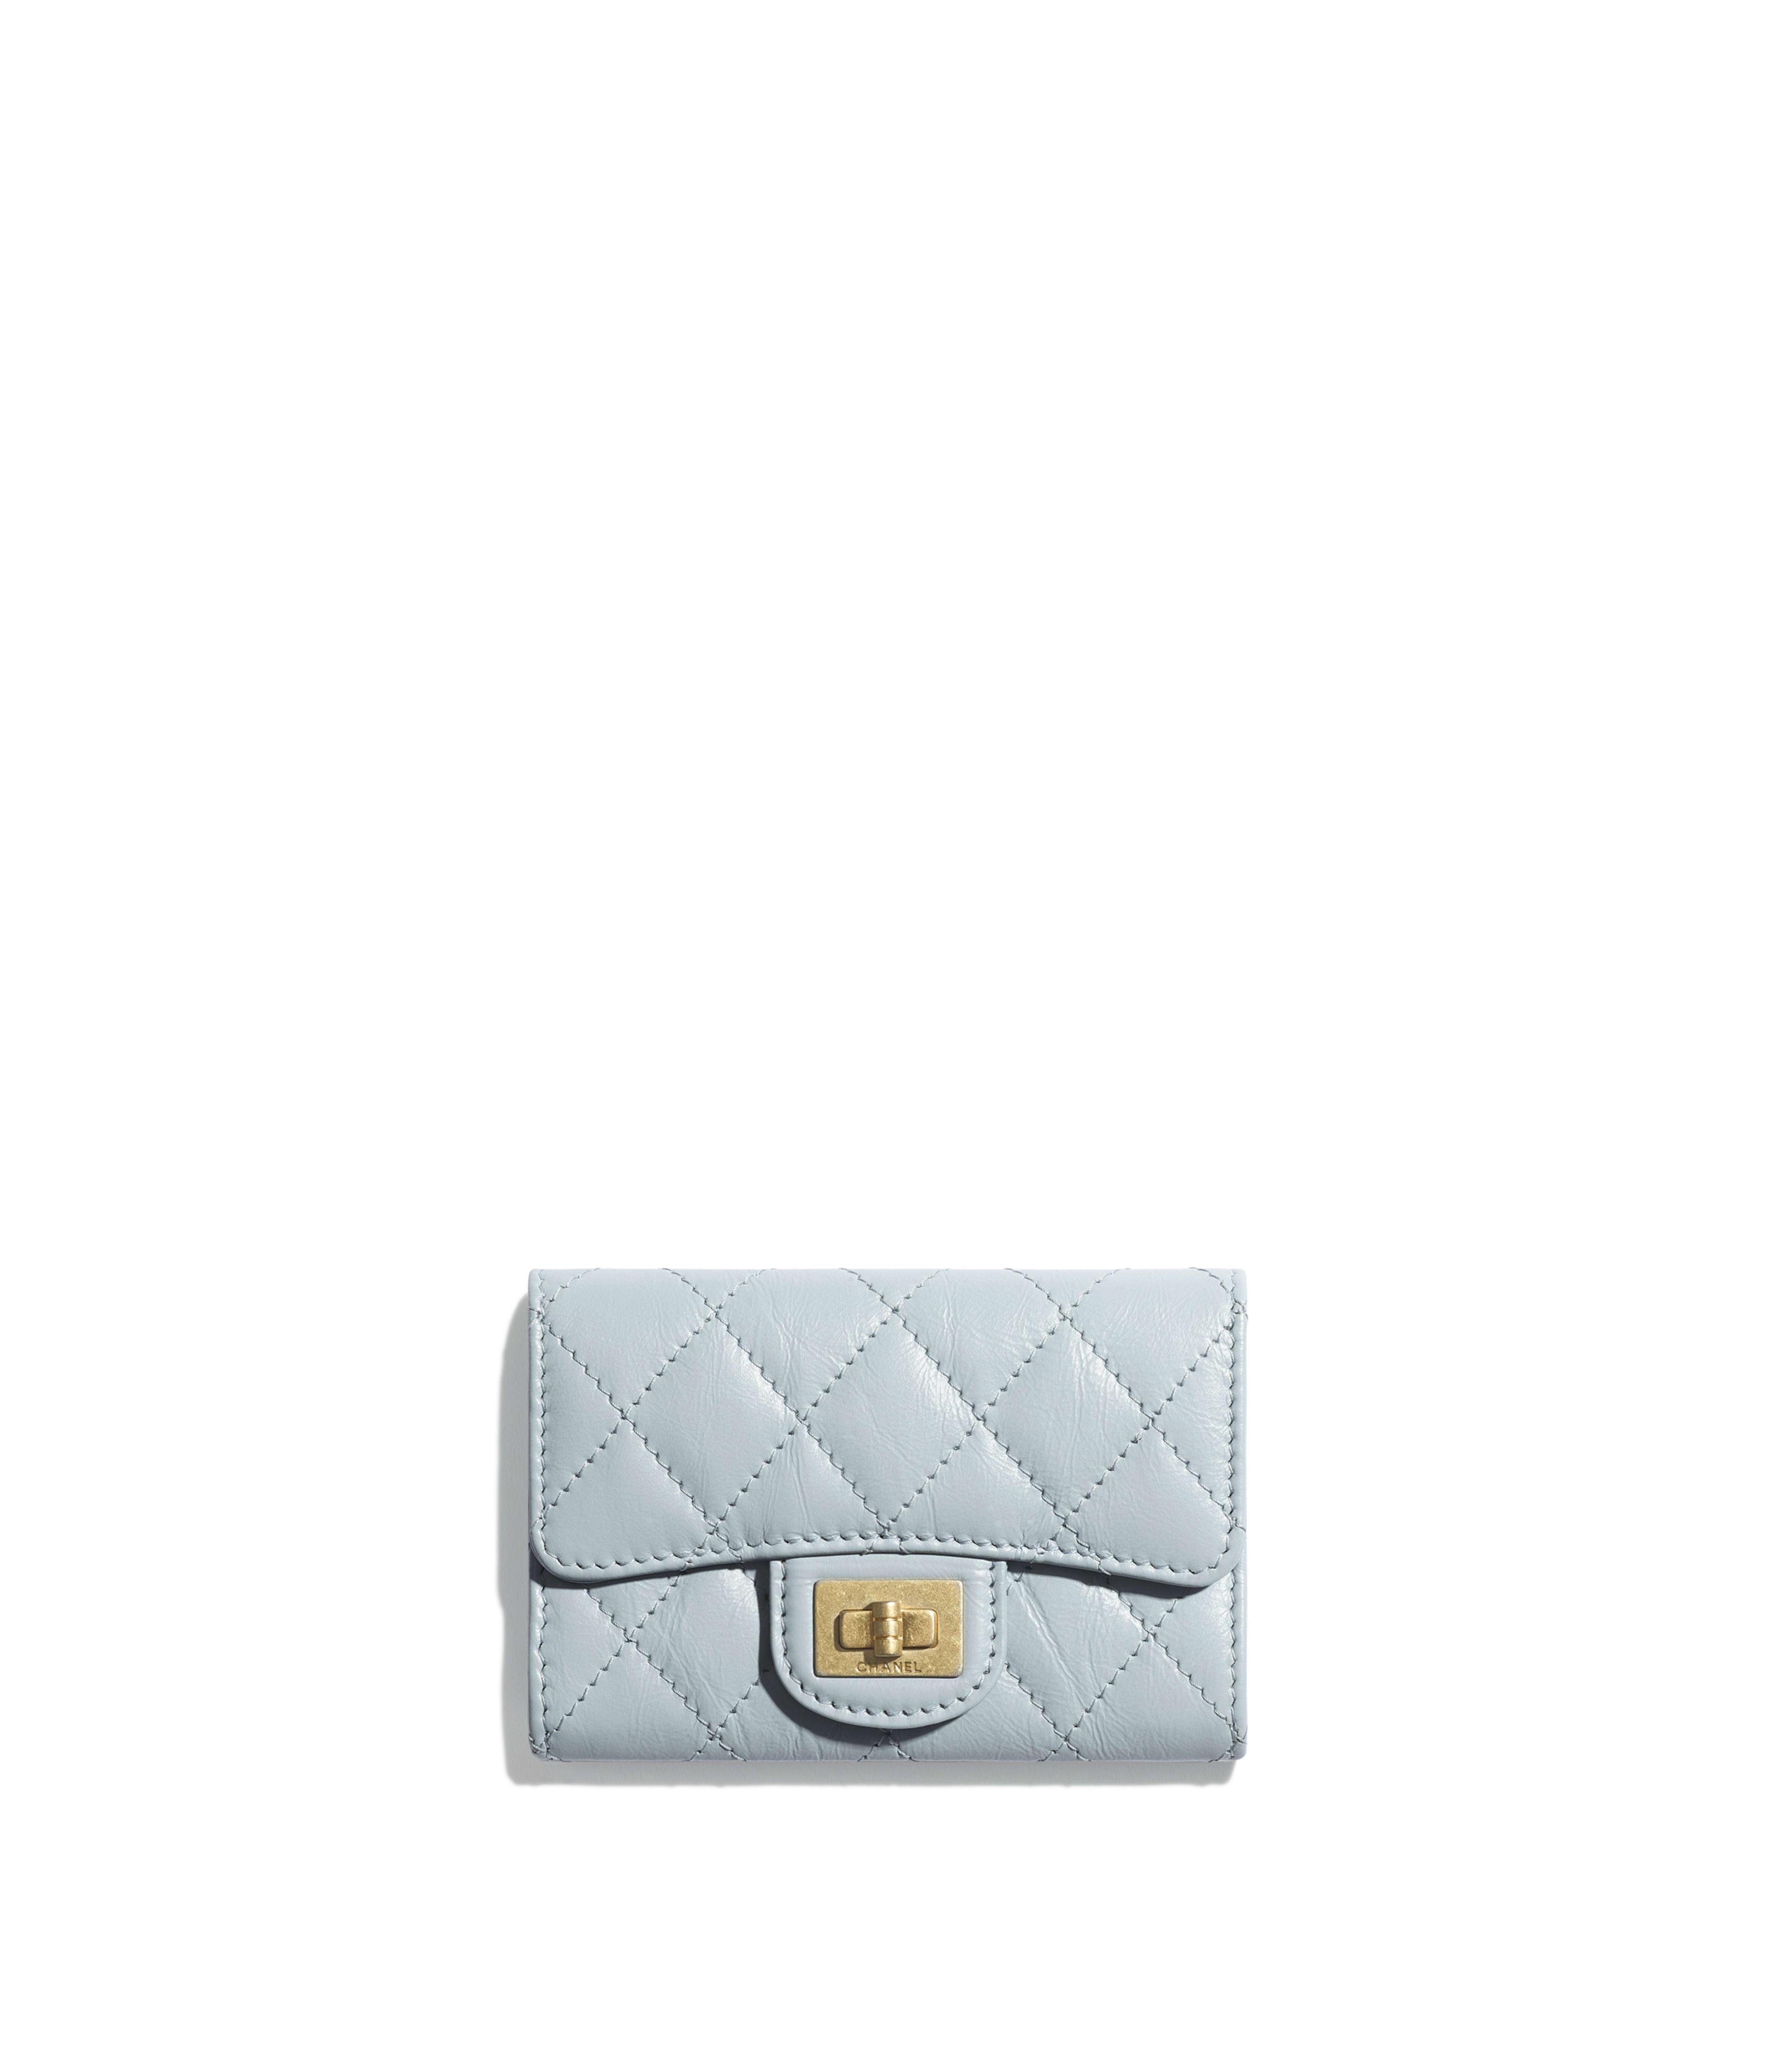 f8a0a6082d92 2.55 Flap Card Holder Aged Calfskin & Gold-Tone Metal, Light Blue Ref.  A80831Y04634N0428